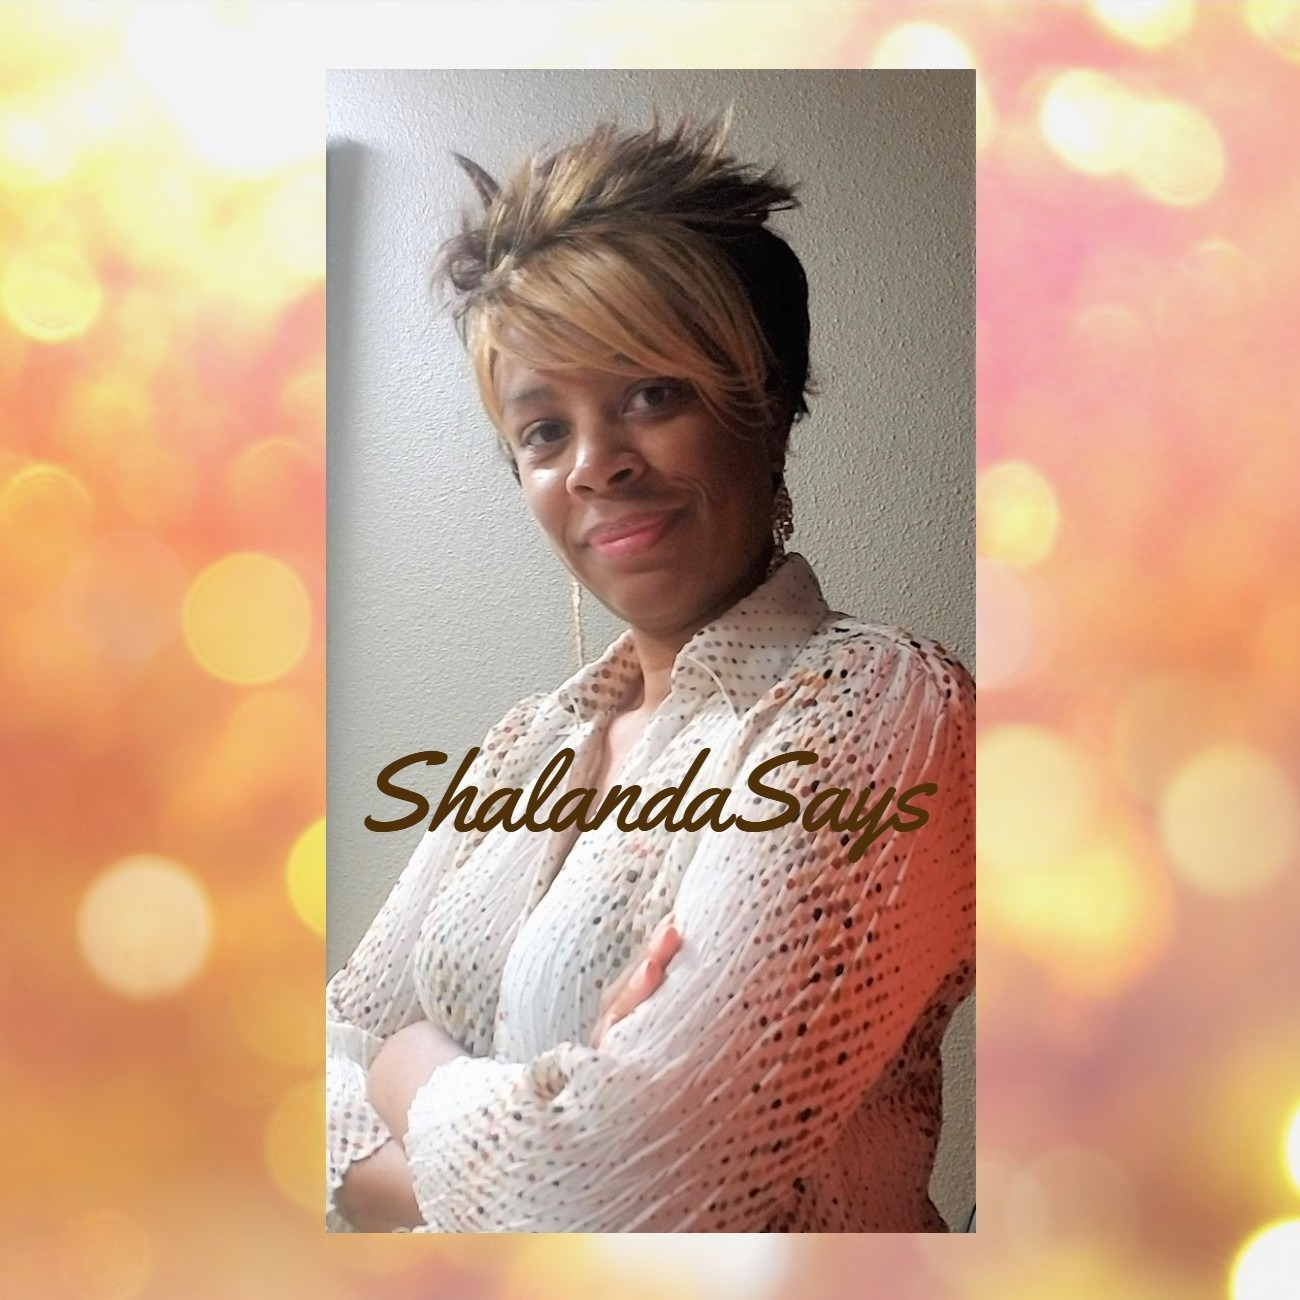 ShalandaSays Meet Relationship Expert Dalila Jusic DeBerge